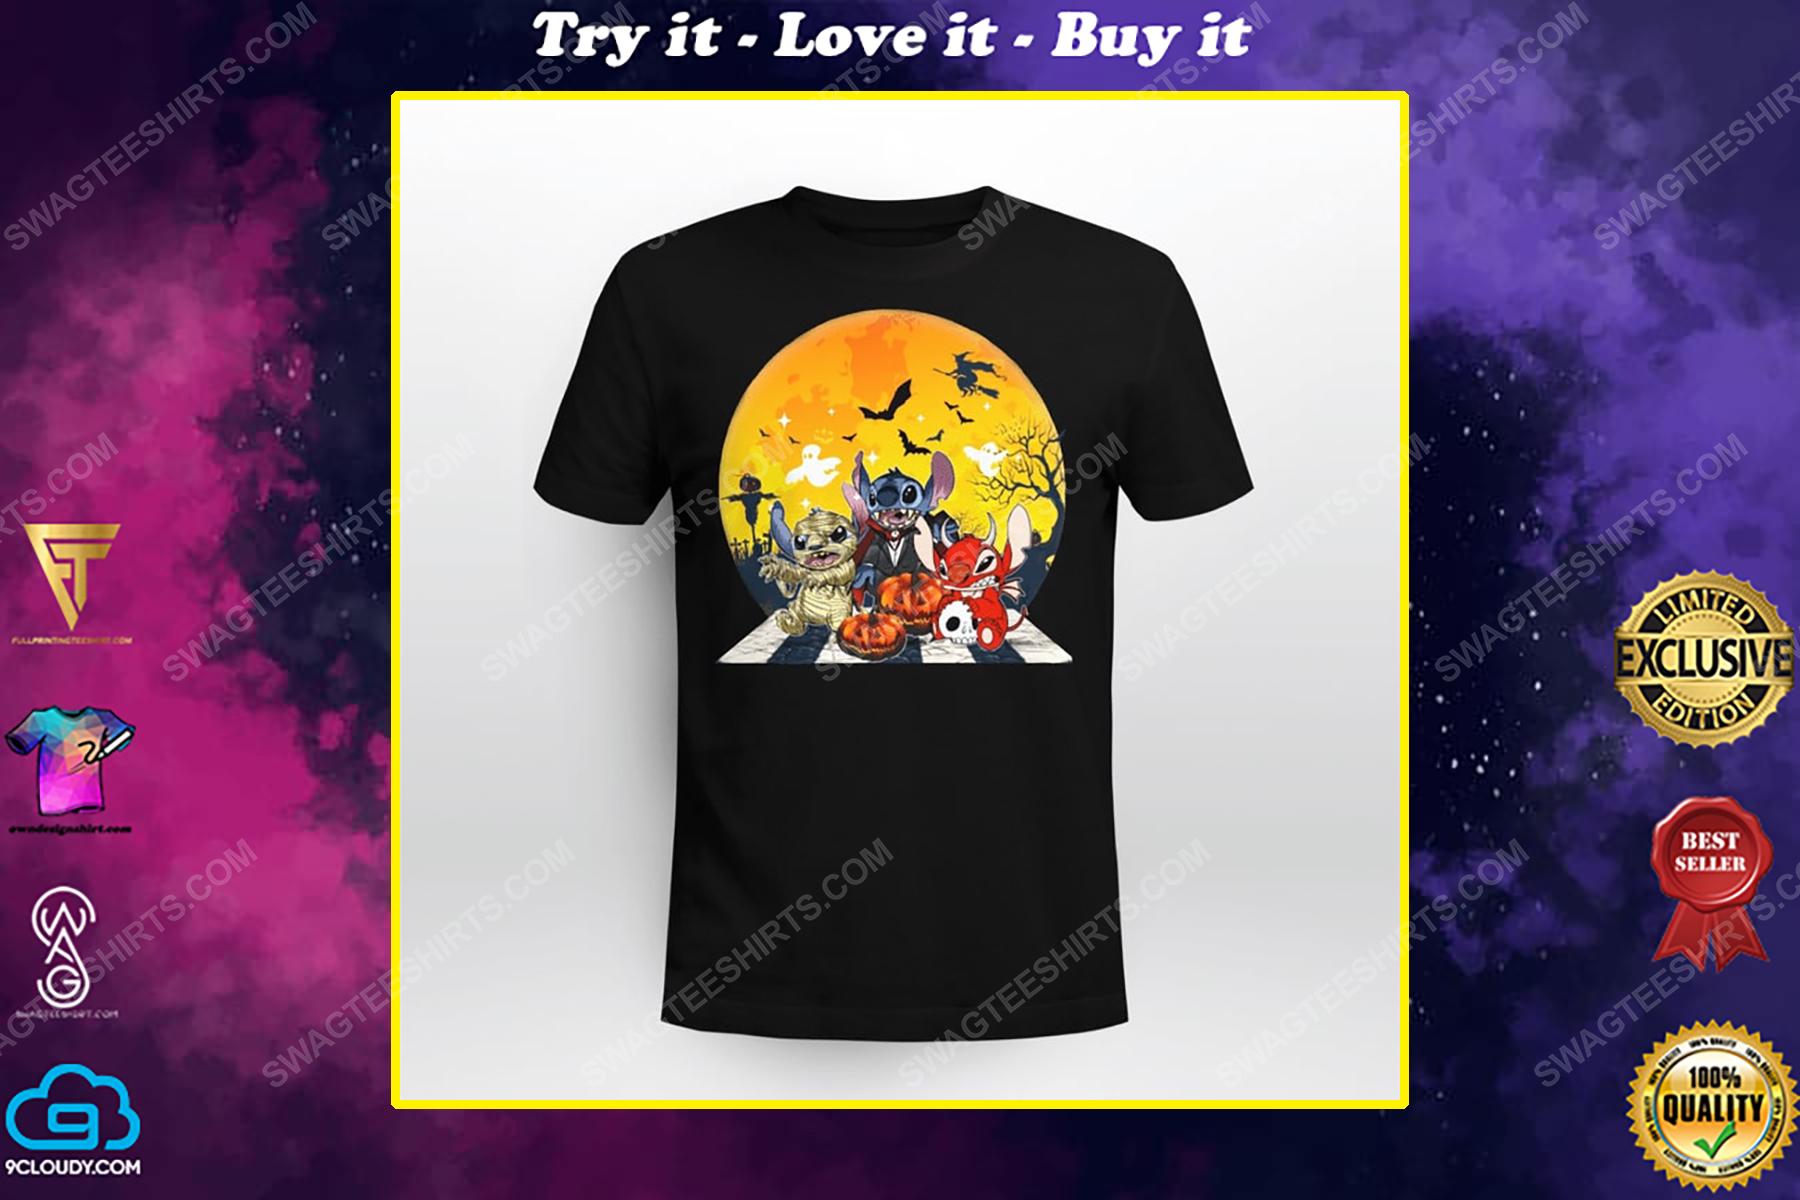 Halloween night stitch cosplay horror characters shirt